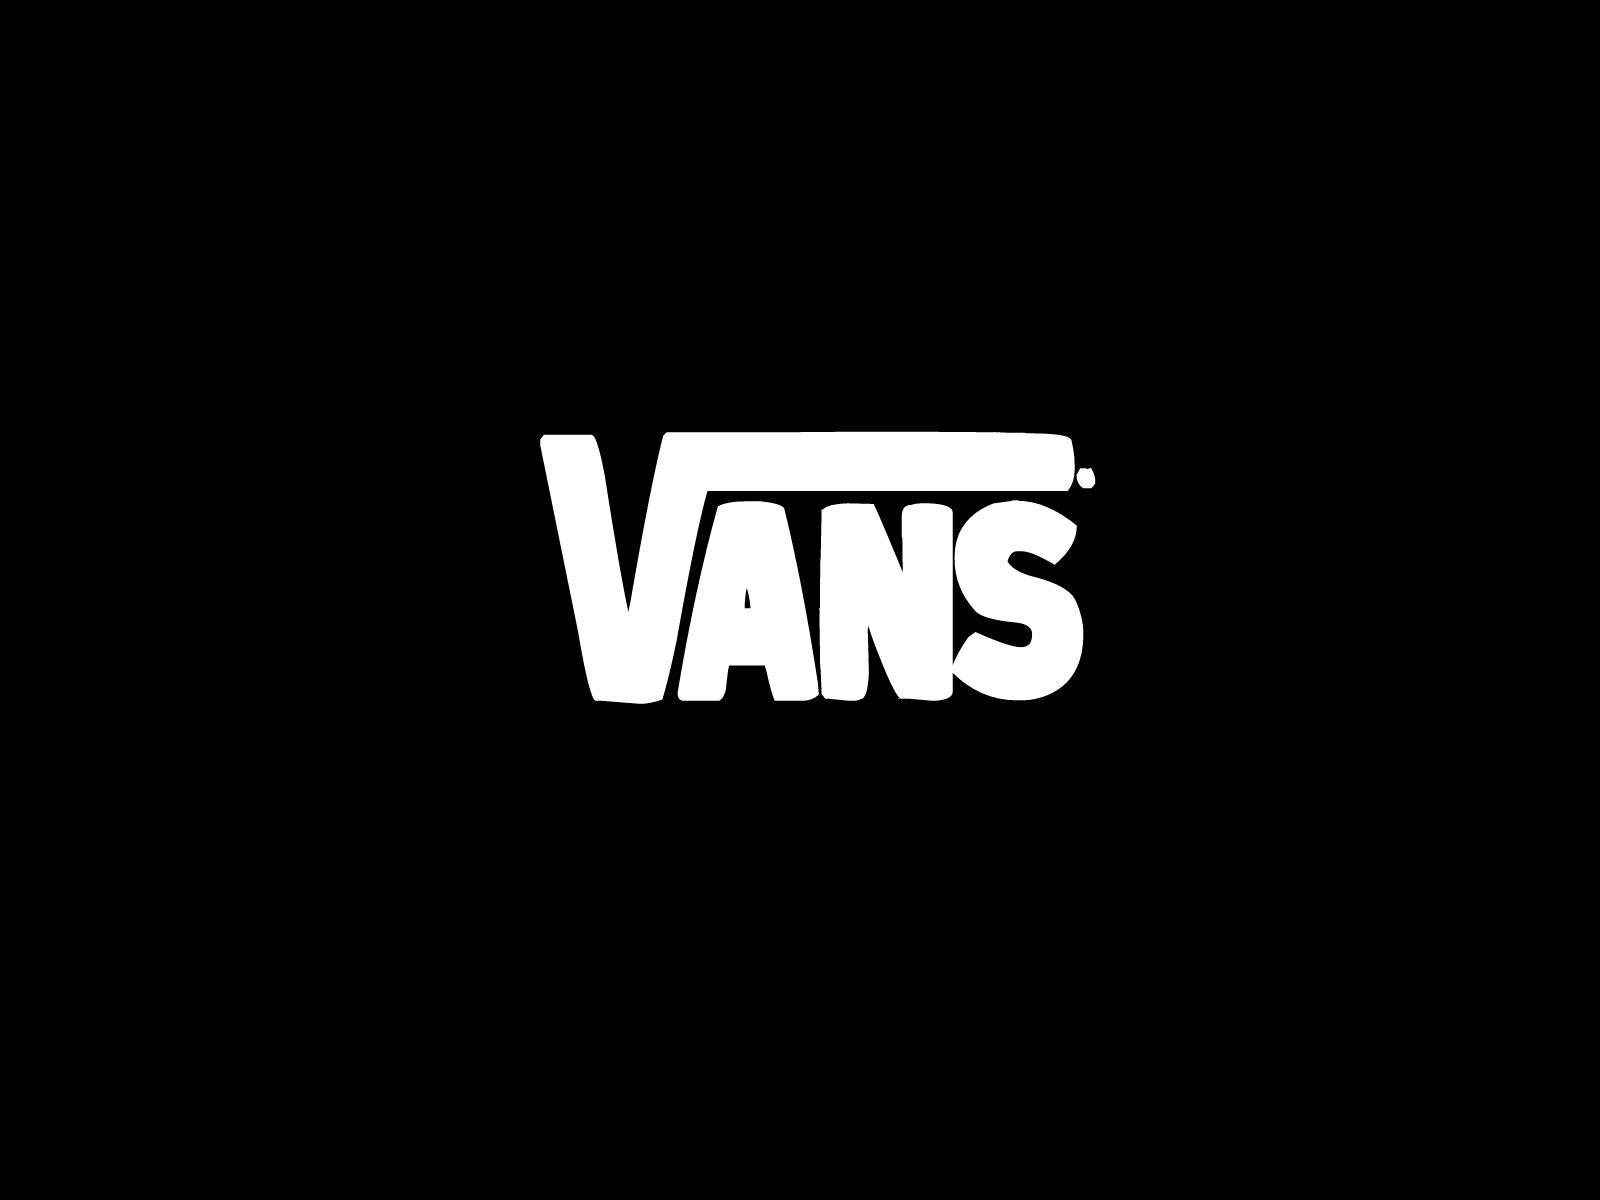 Images For Vans Logo Wallpaper 1600x1200